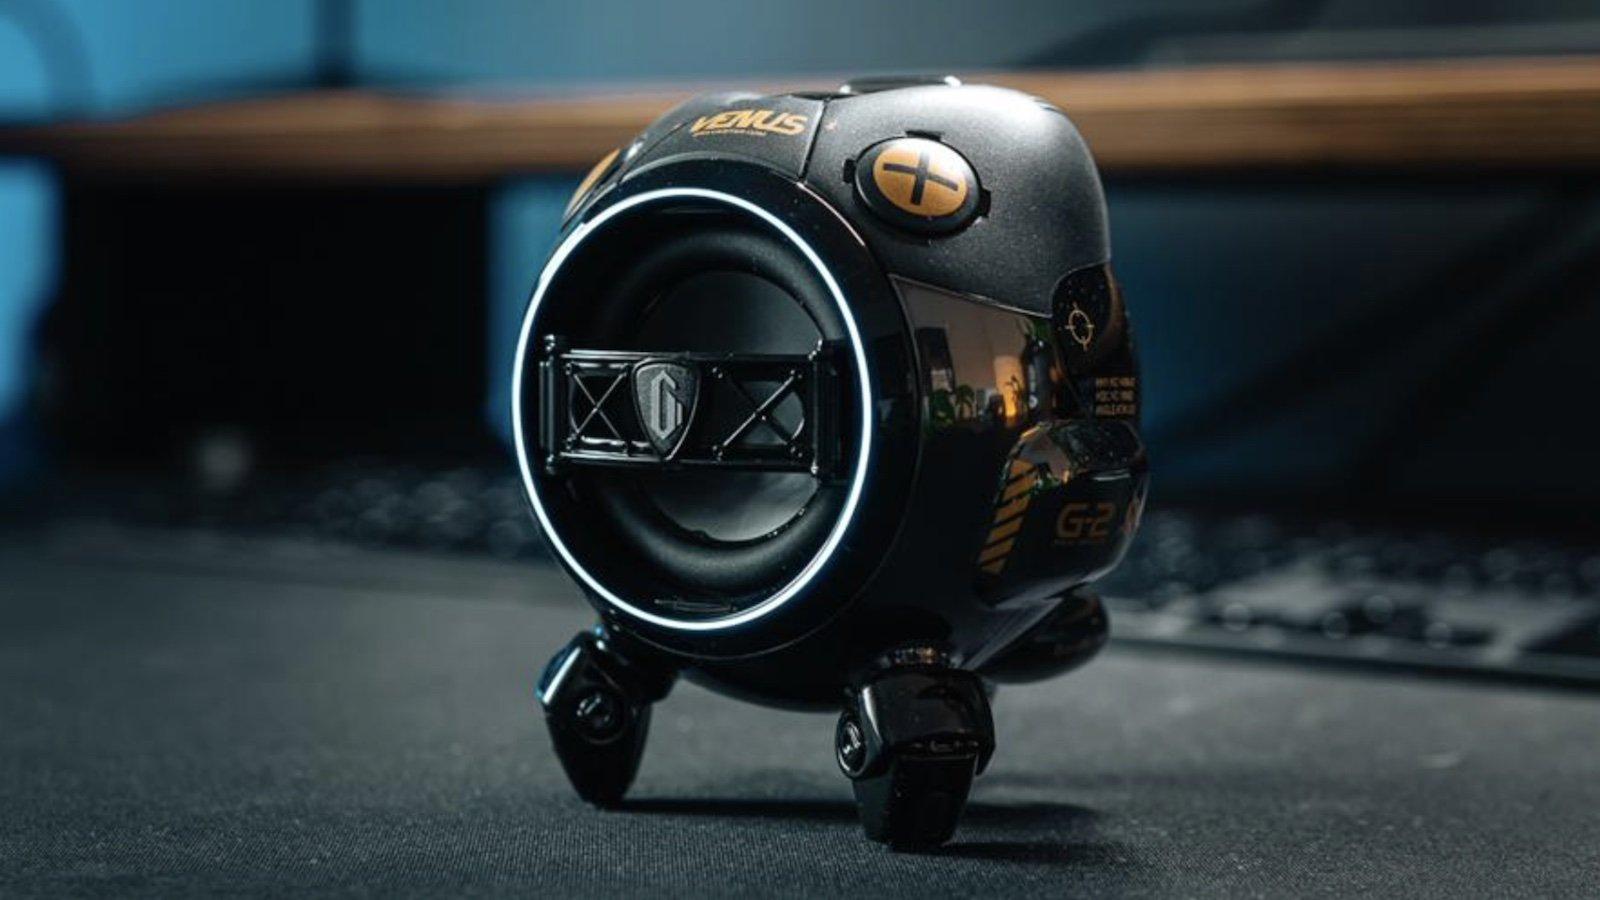 GravaStar Venus futuristic portable speaker has a unique design and a zinc alloy shell